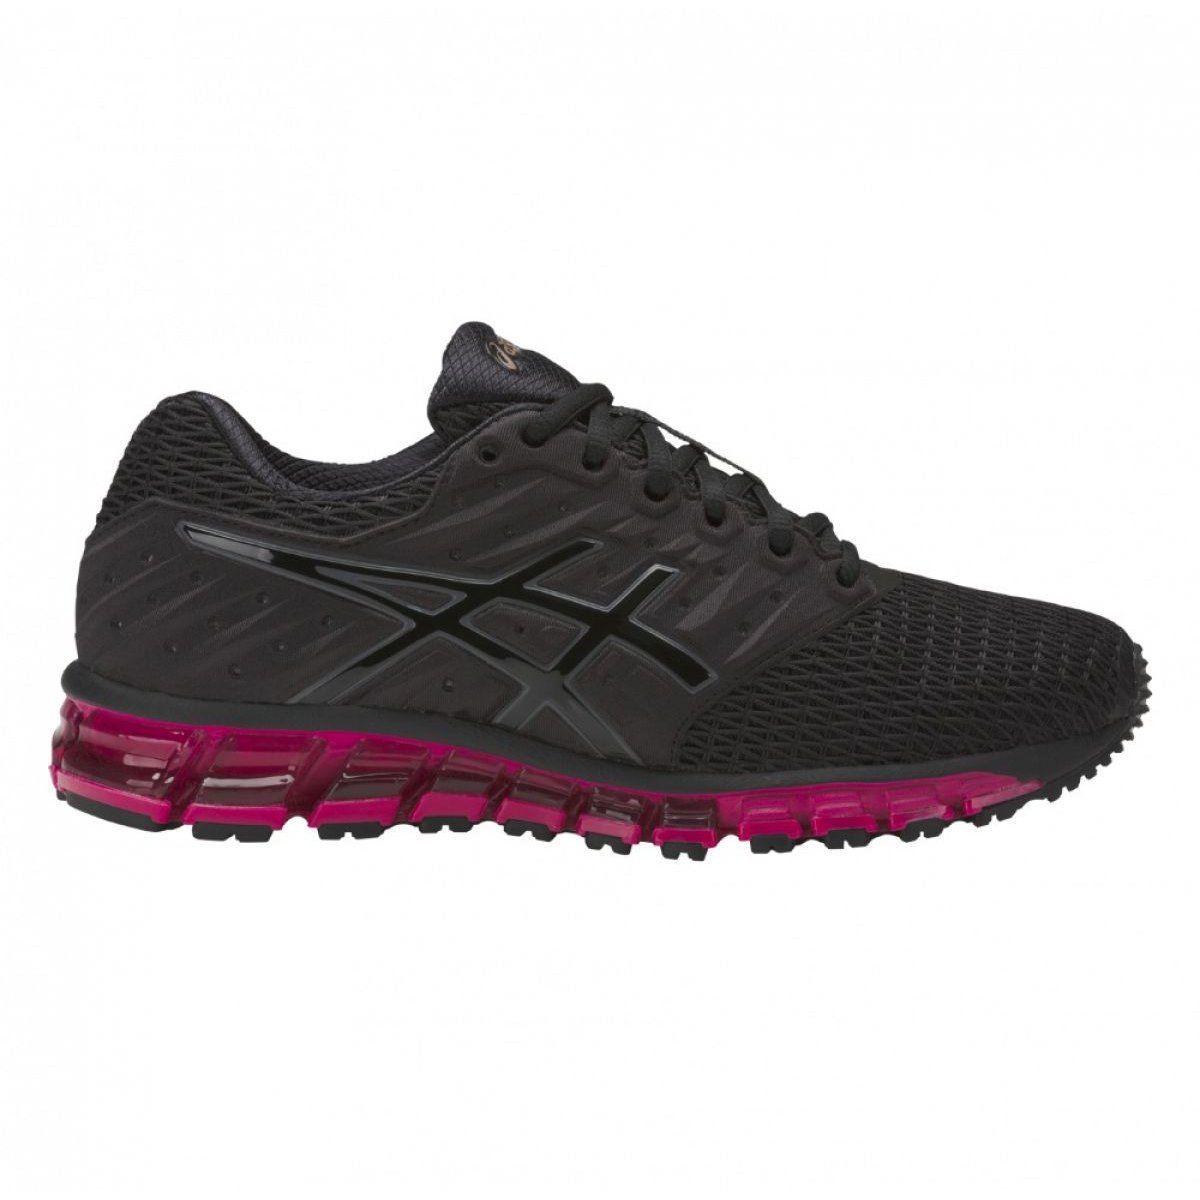 Buty Biegowe Asics Gel Quantum 180 2 W T6g7n 9090 Czarne Fioletowe Womens Training Shoes Training Shoes Asics Running Shoes